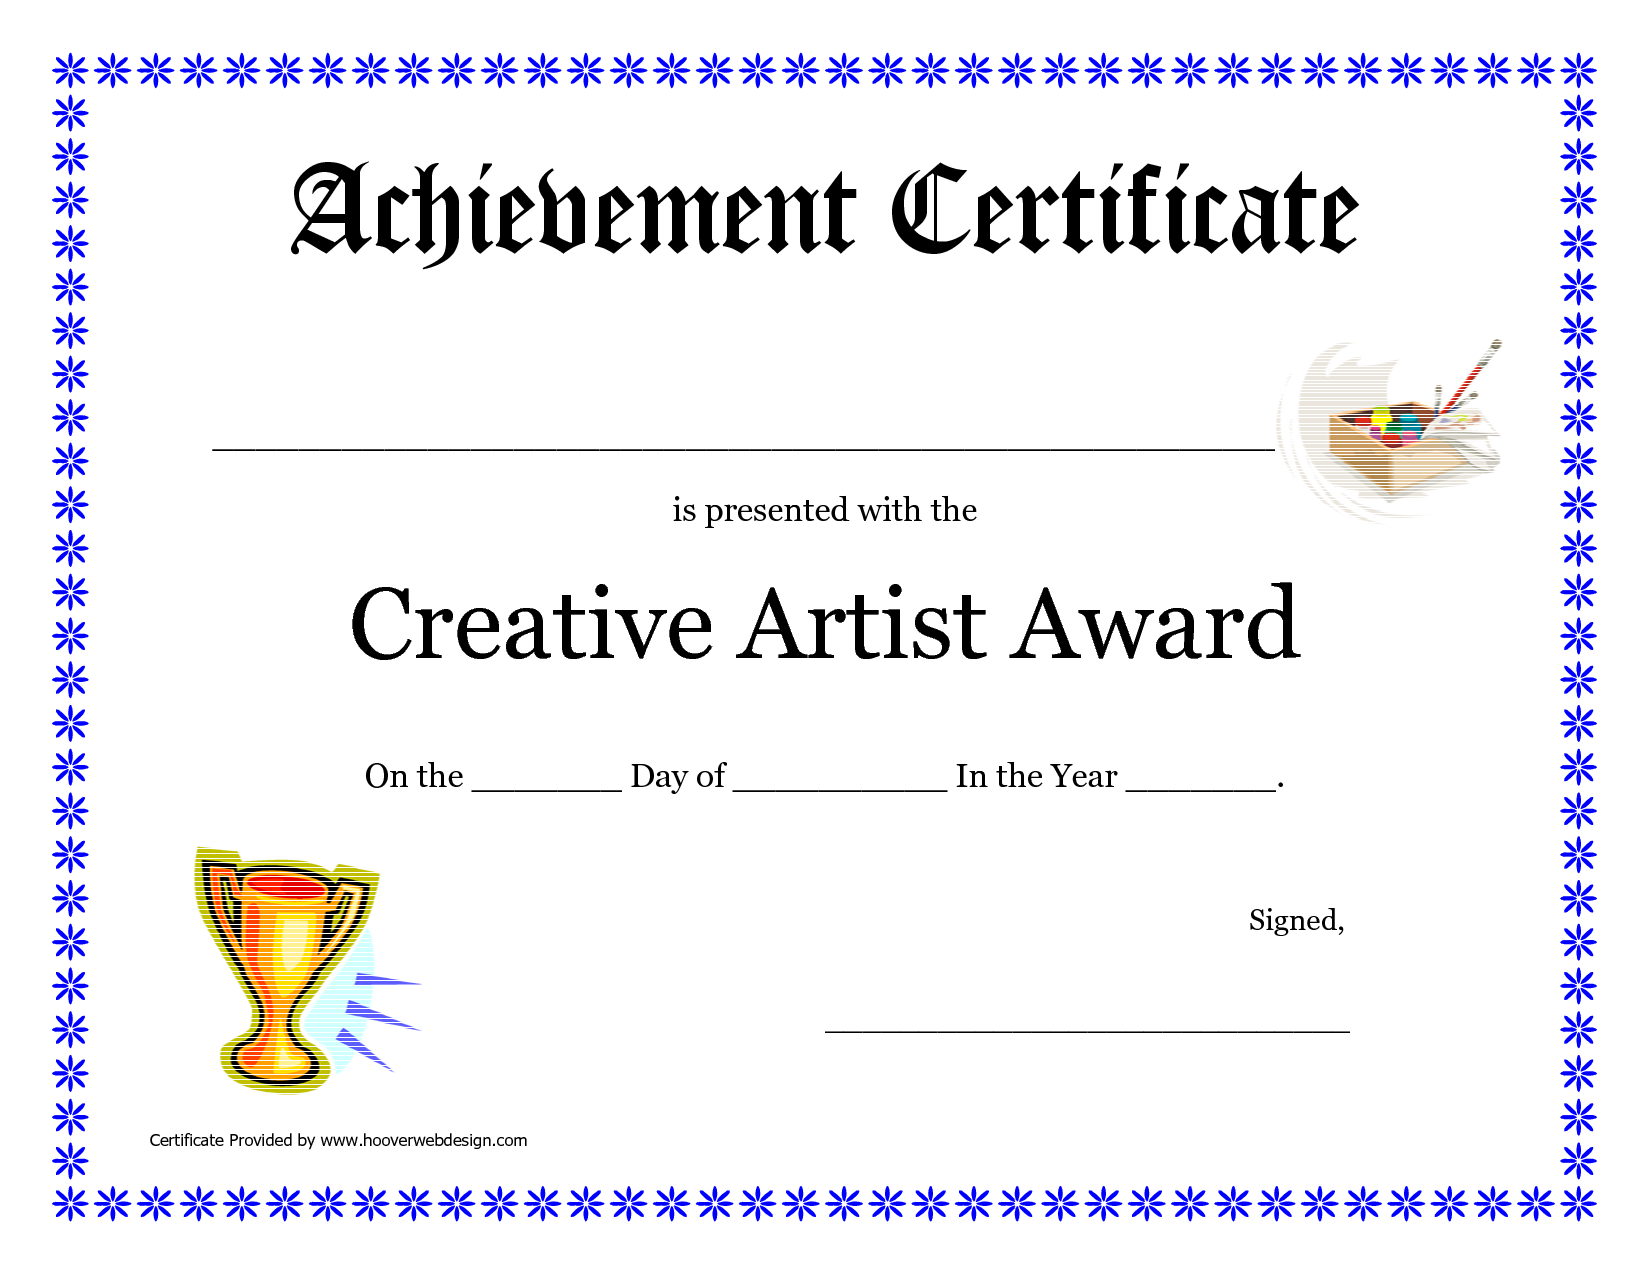 Creative artist award printable certificate pdf cakepins creative artist award printable certificate pdf cakepins alramifo Image collections